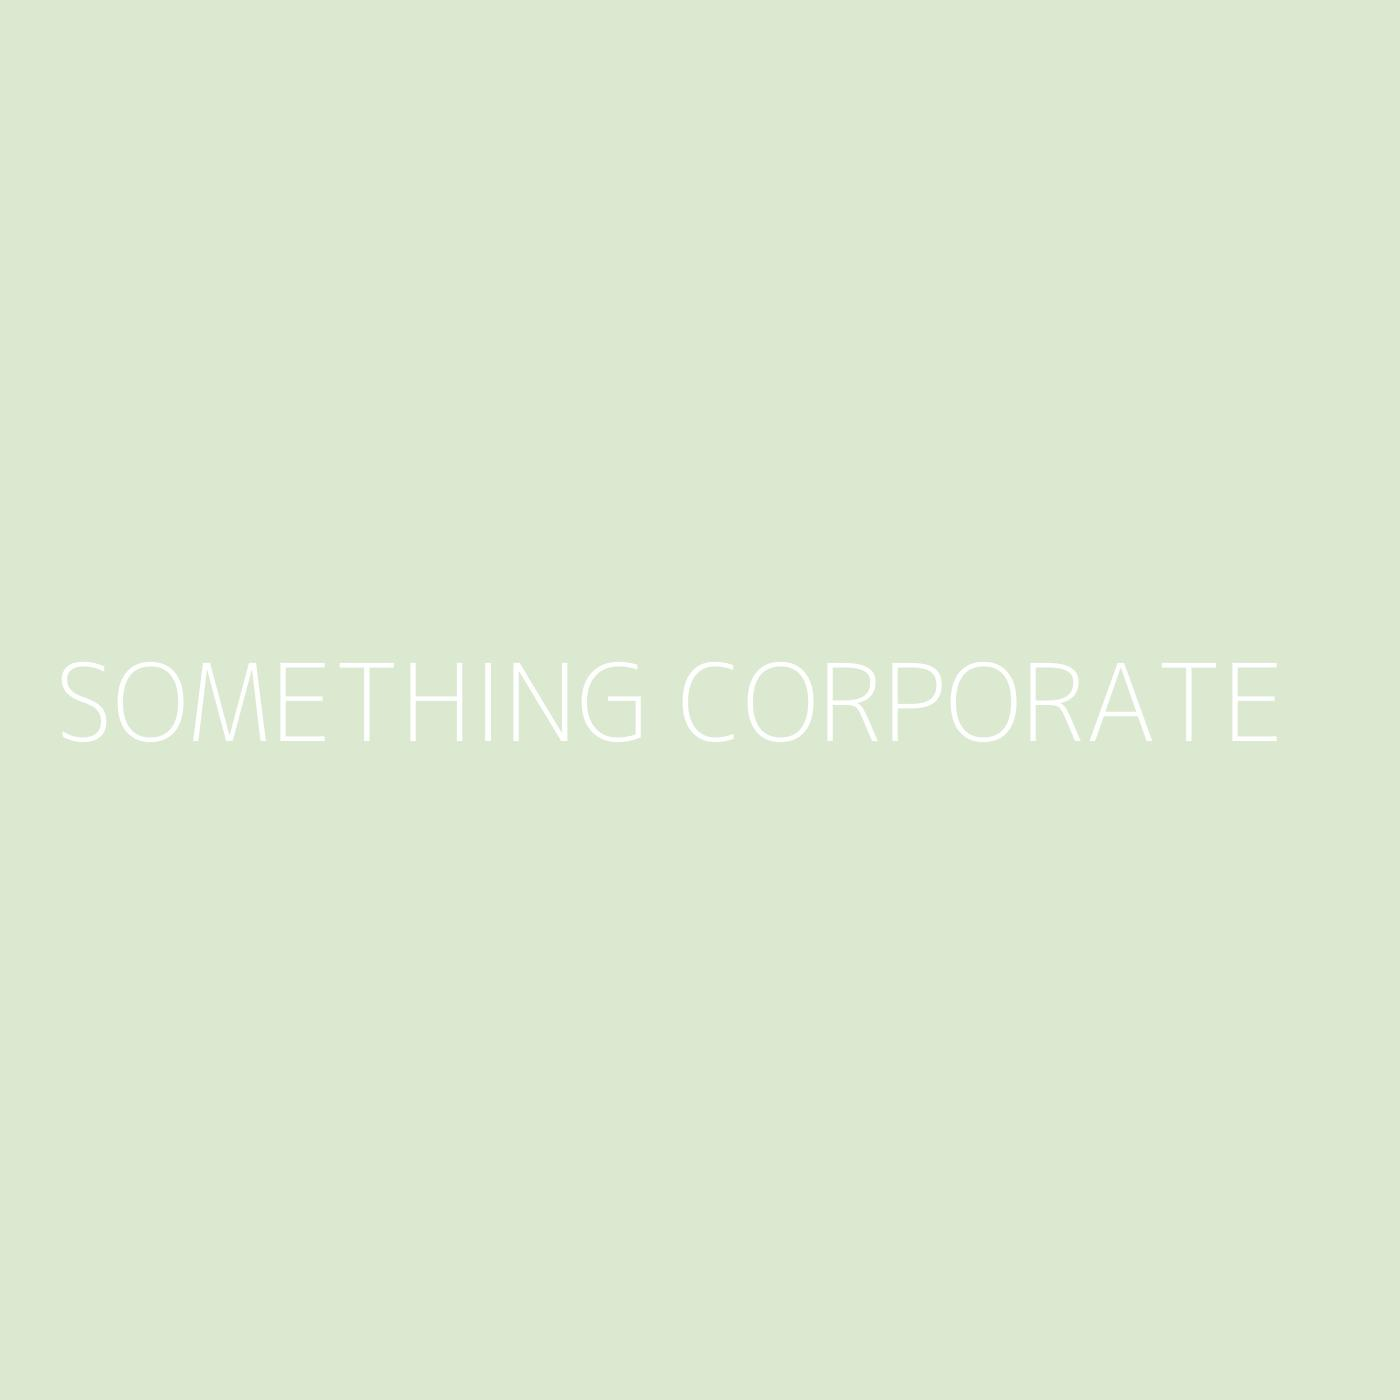 Something Corporate Playlist Artwork